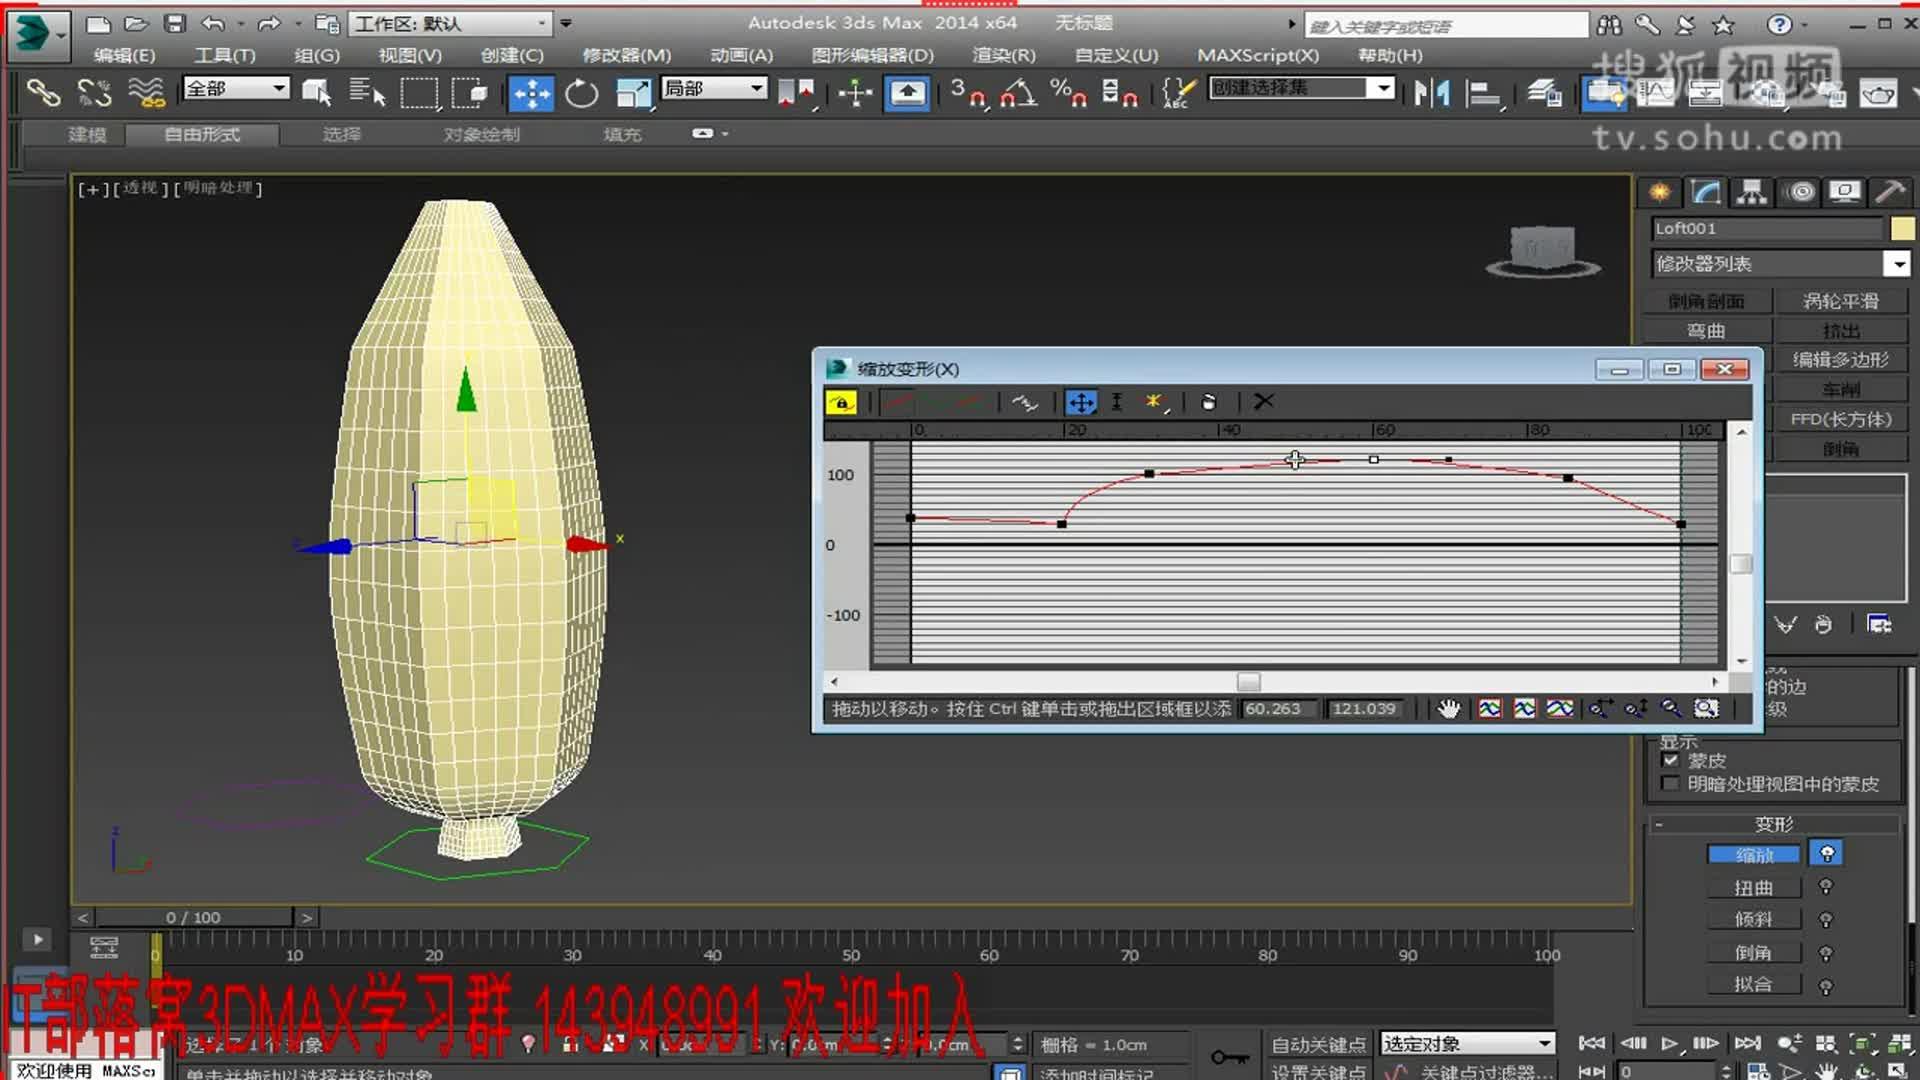 3dmax室内设计教程3d教程 3dmax视频教程 3dmax教程 3d视频教程第17课3Dmax基础教程放样-放样操作-制作石膏线-制作香蕉